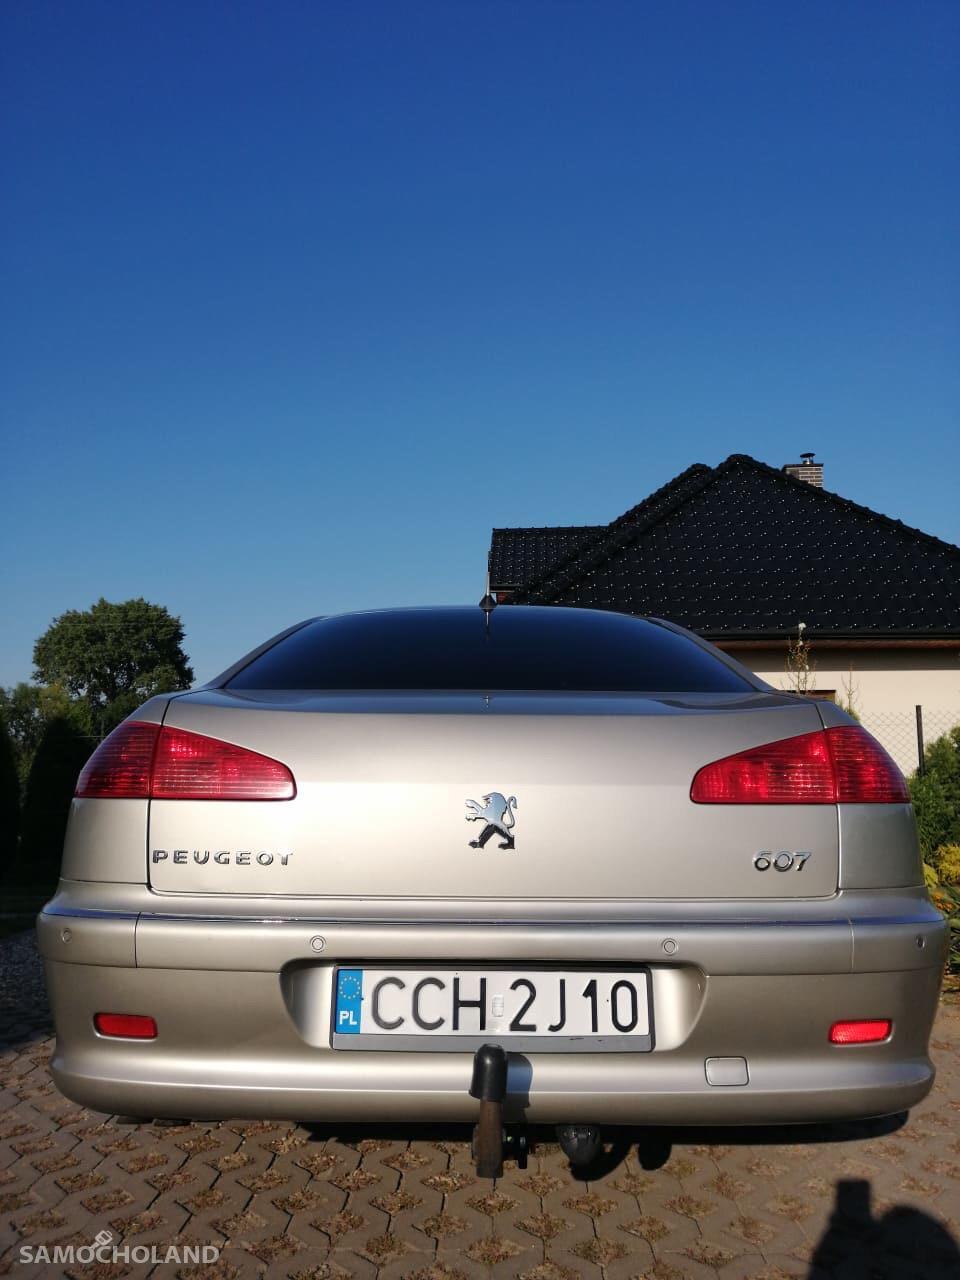 Peugeot 607 2.7 HDI V6 BiTurbo Platinum 2005r 2